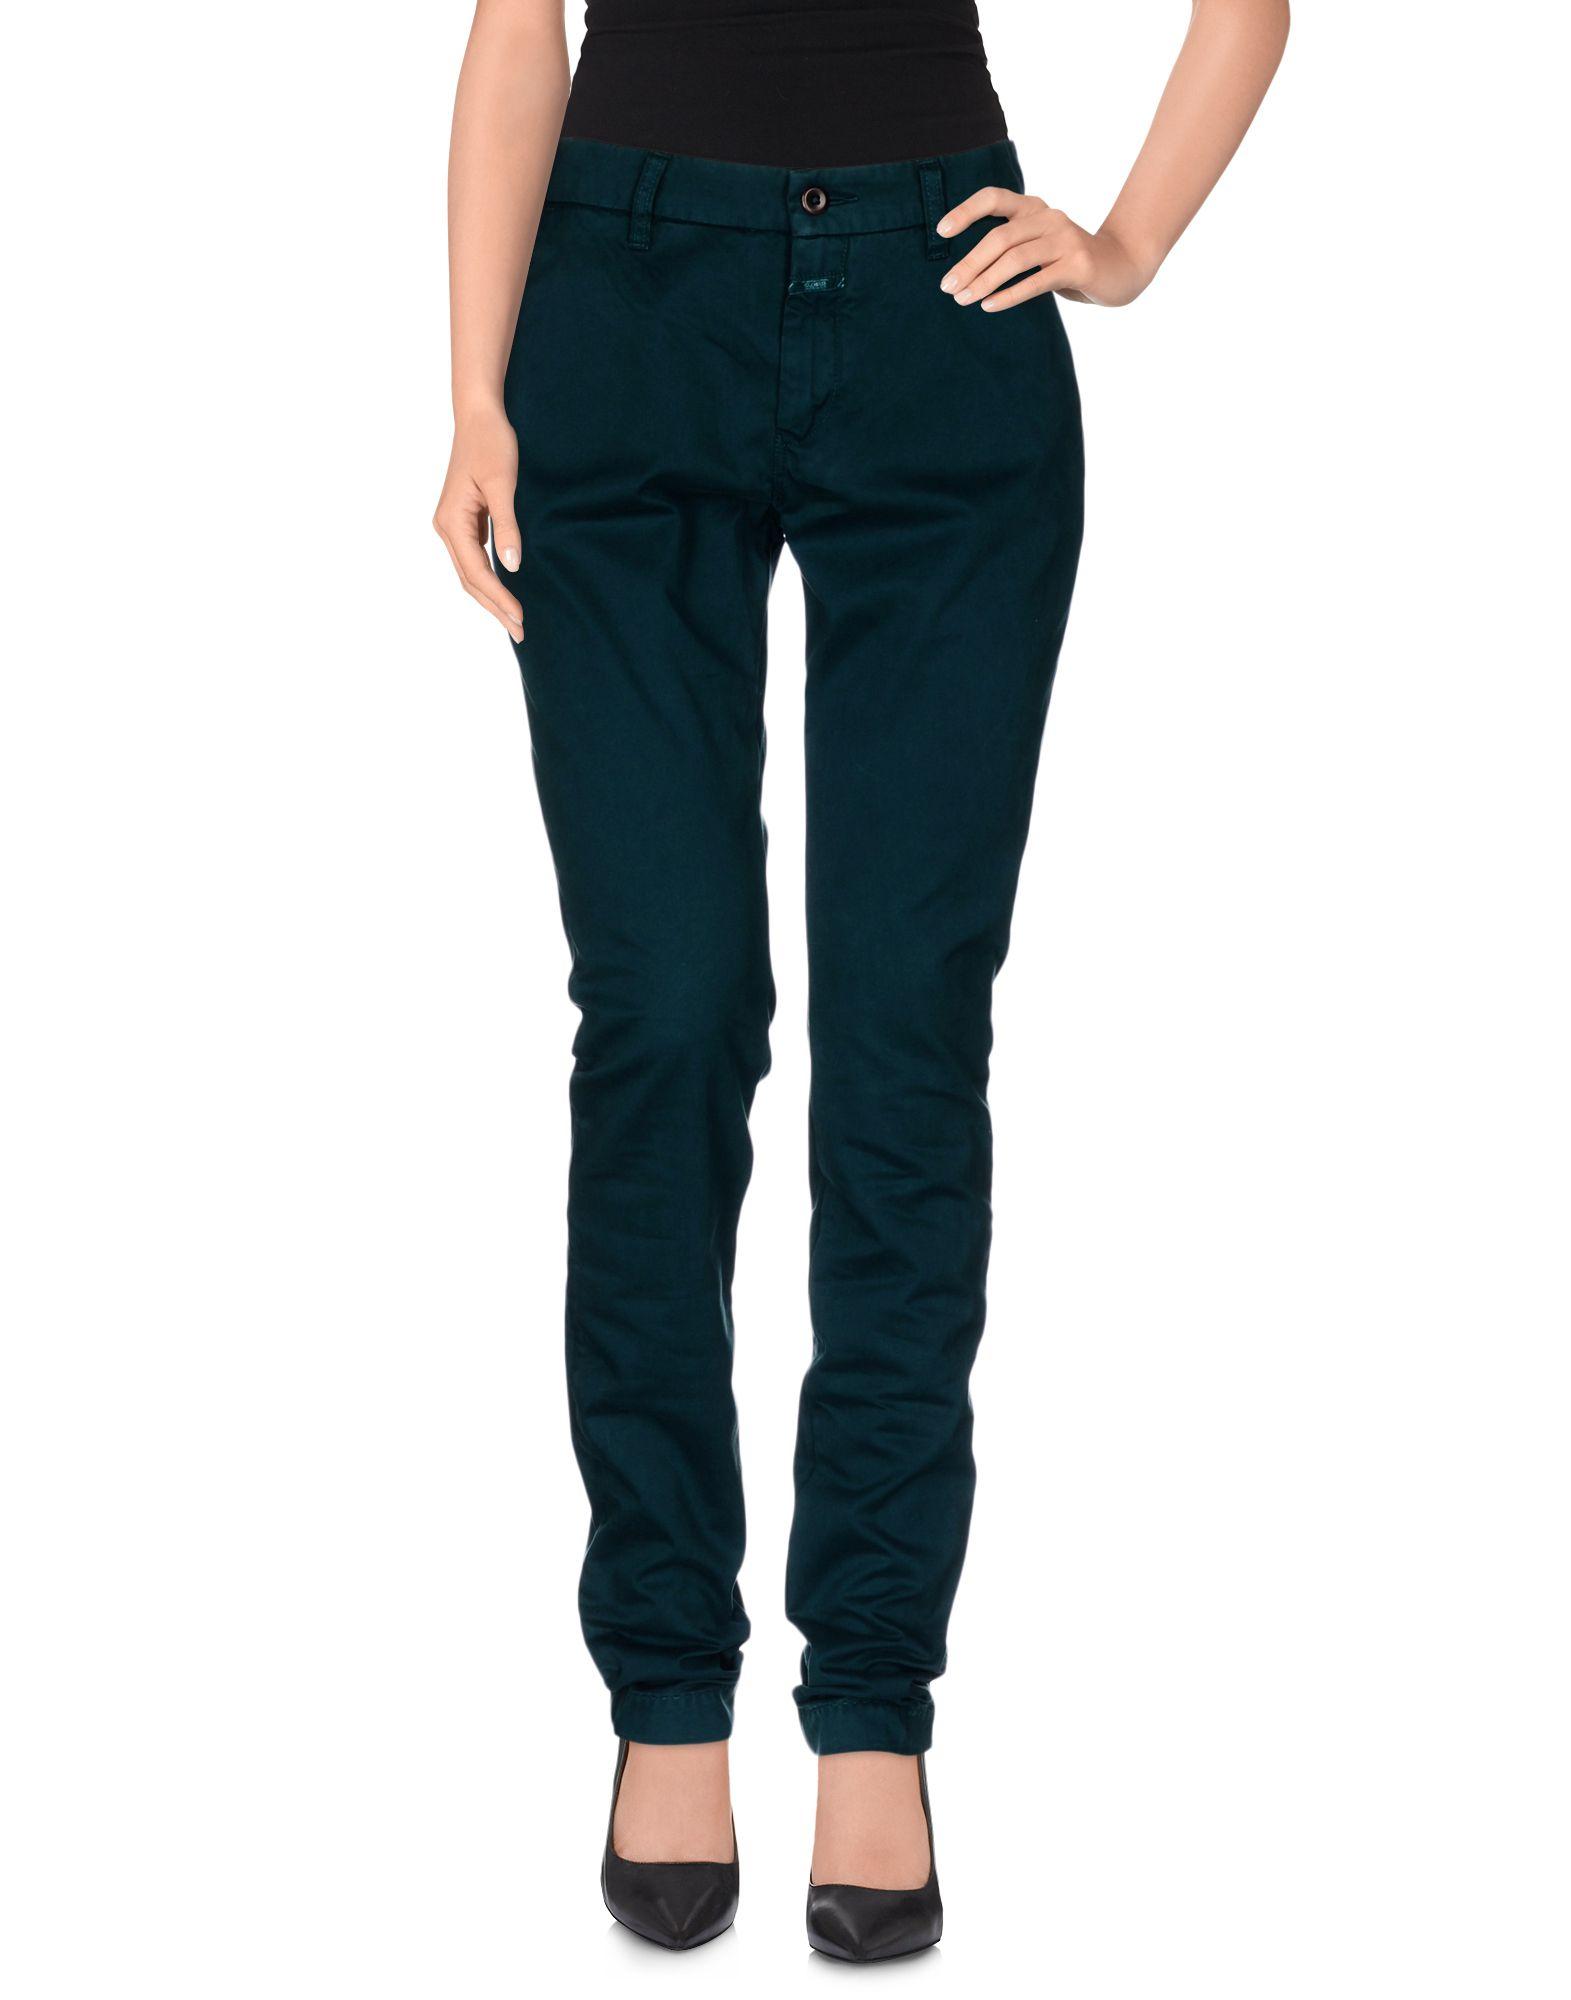 CLOSED Damen Hose Farbe Dunkelgrün Größe 3